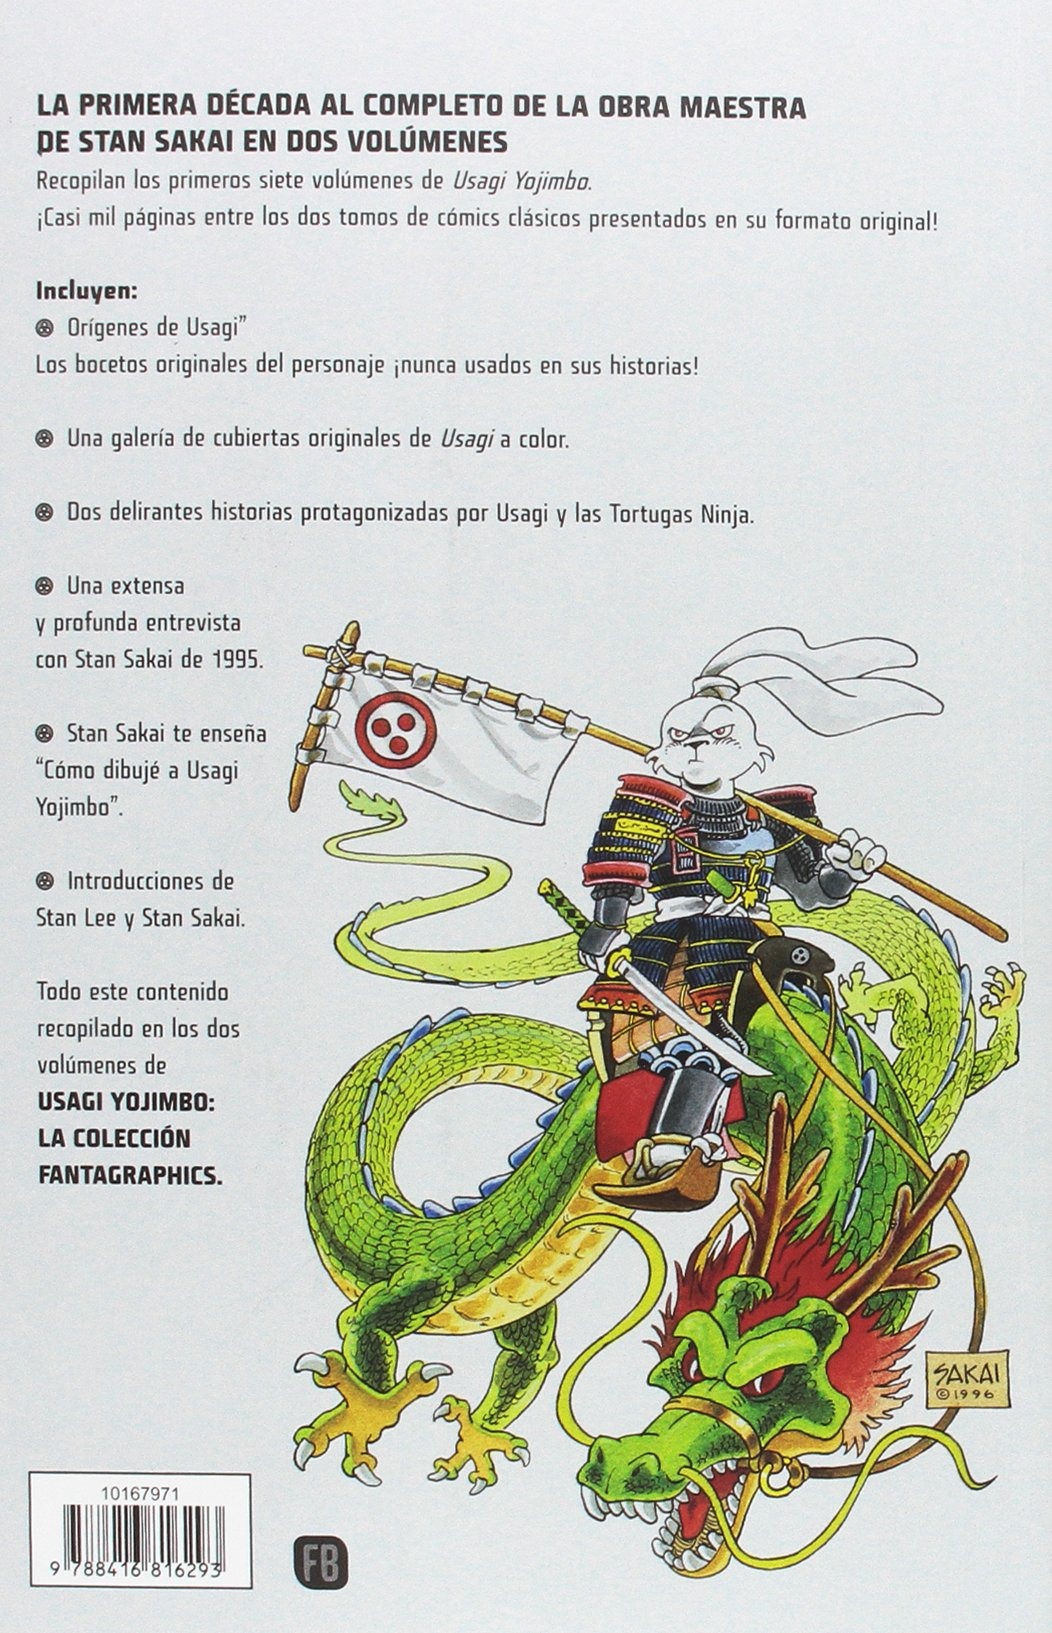 Usagi Yojimbo Fantagraphics nº 02/02 Integral Independientes ...